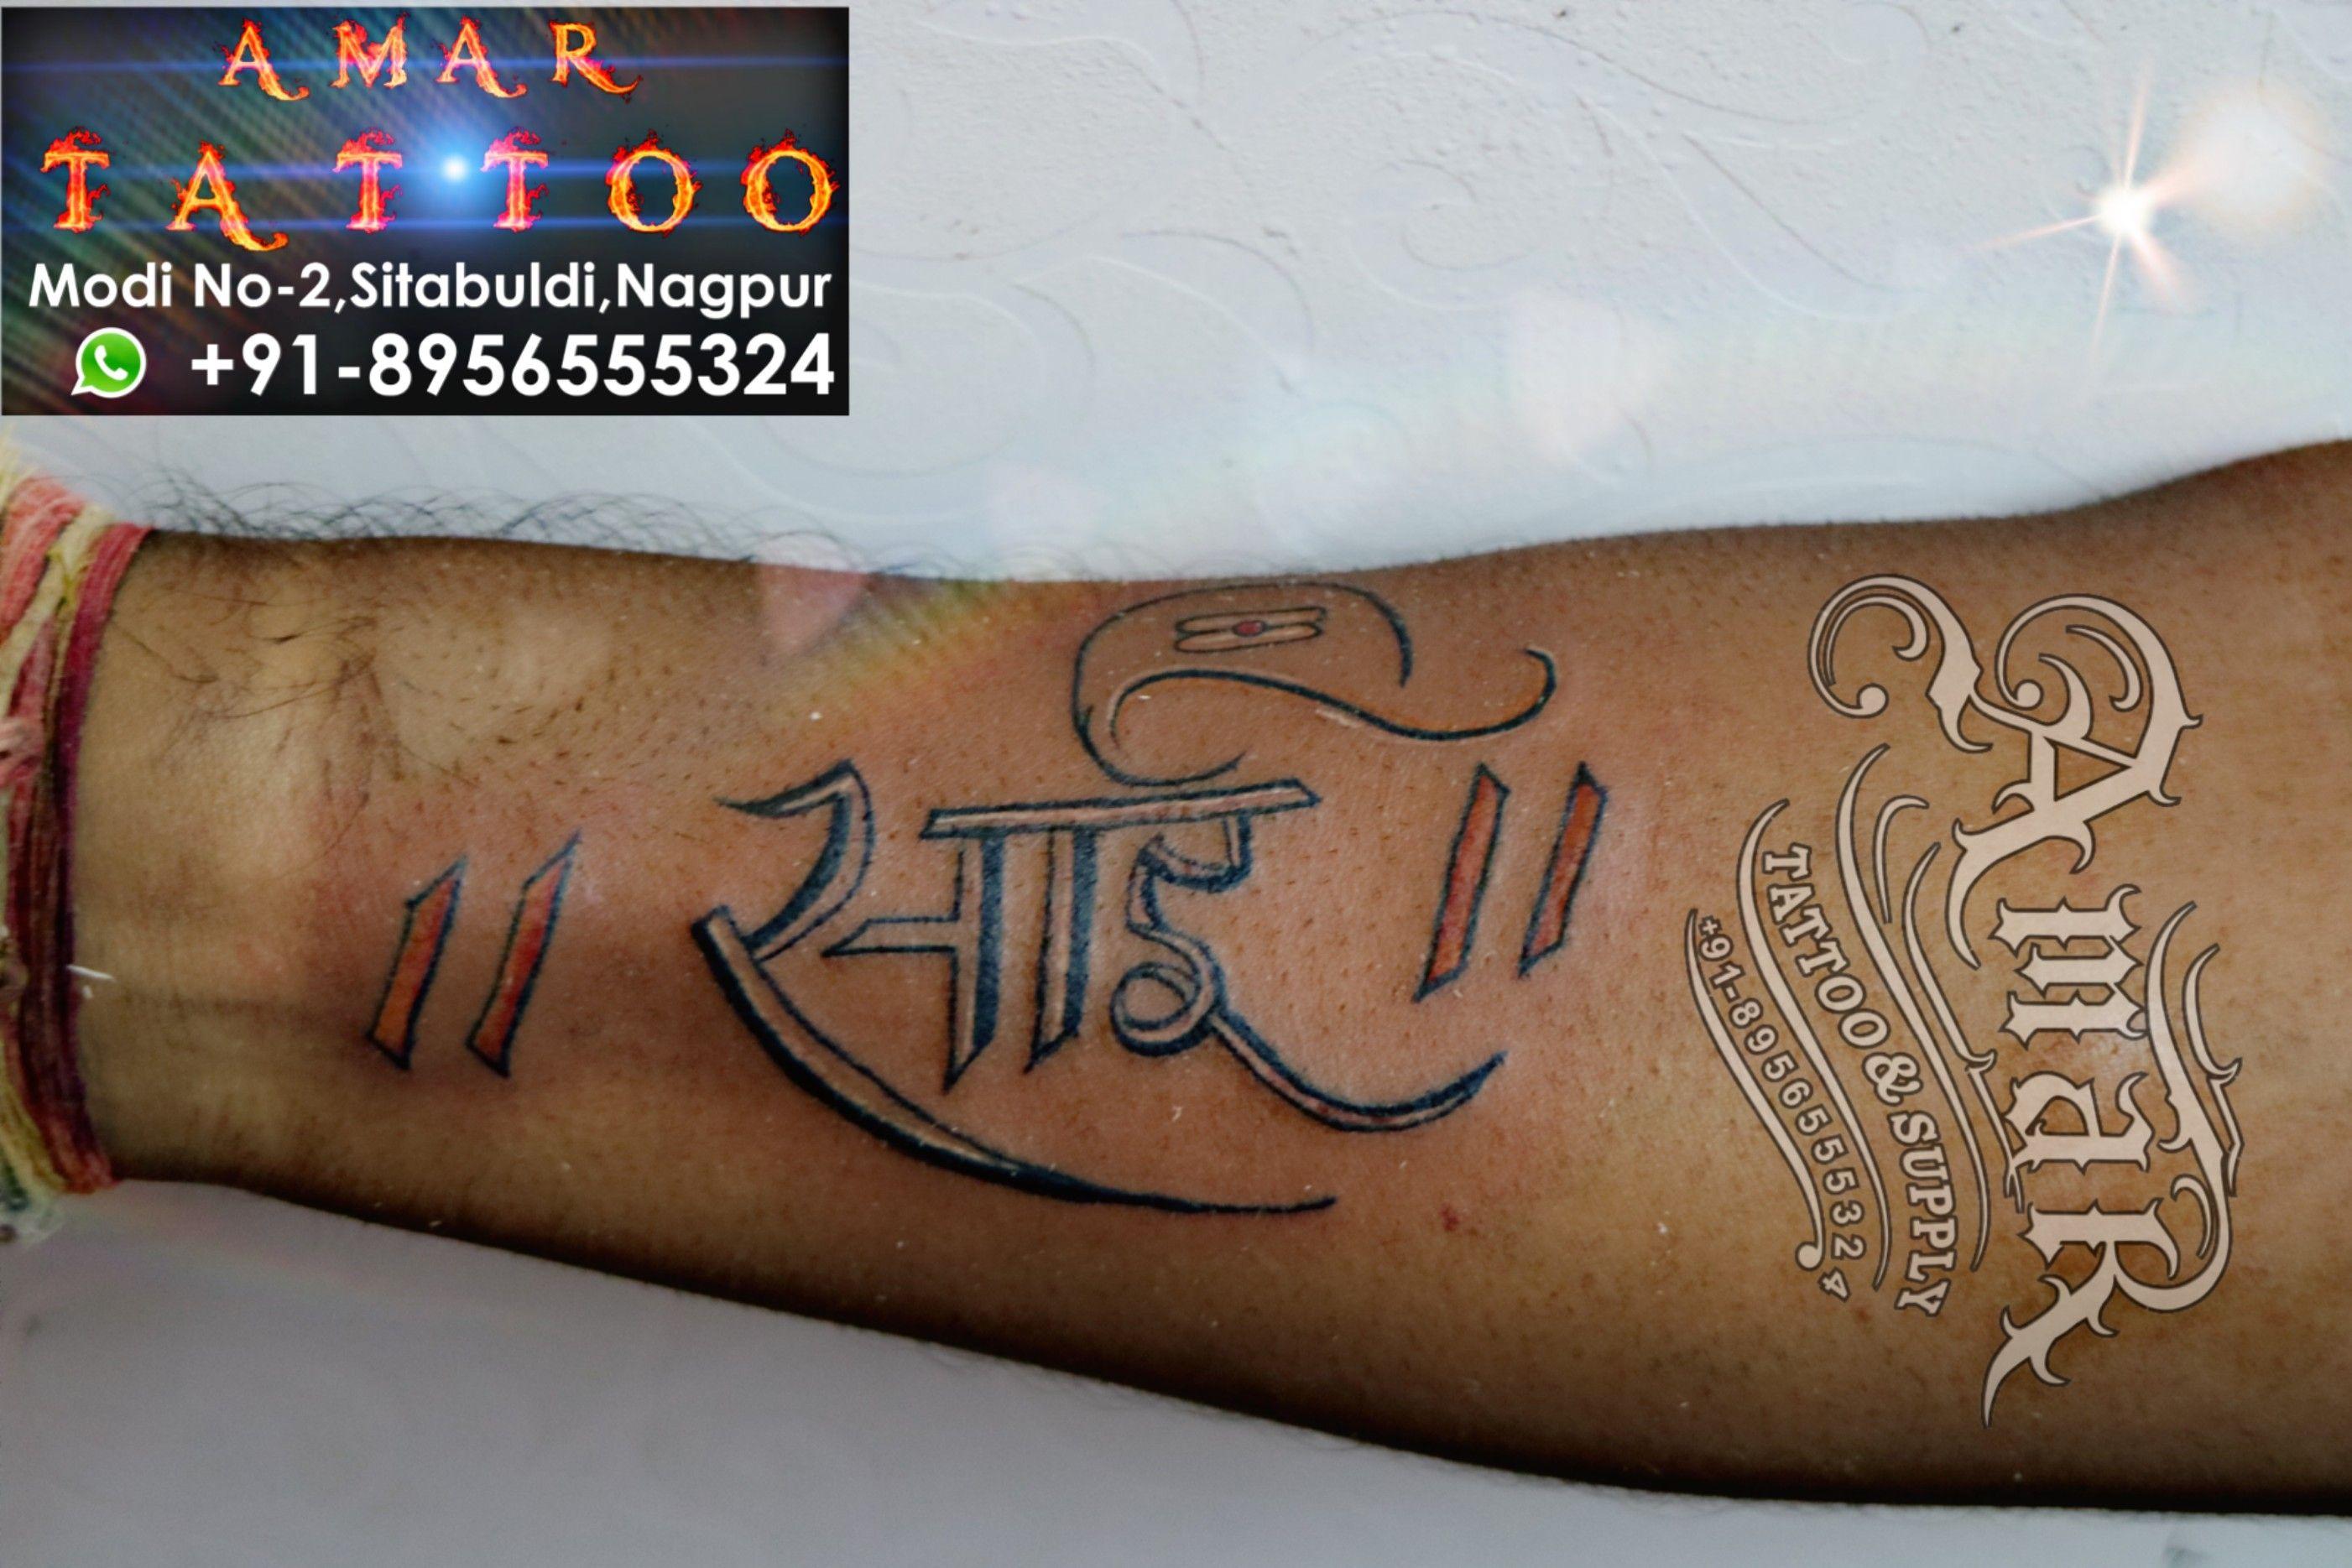 Sai Tattoo By Amar In 2020 Tattoo Shop Tattoos Picture Tattoos